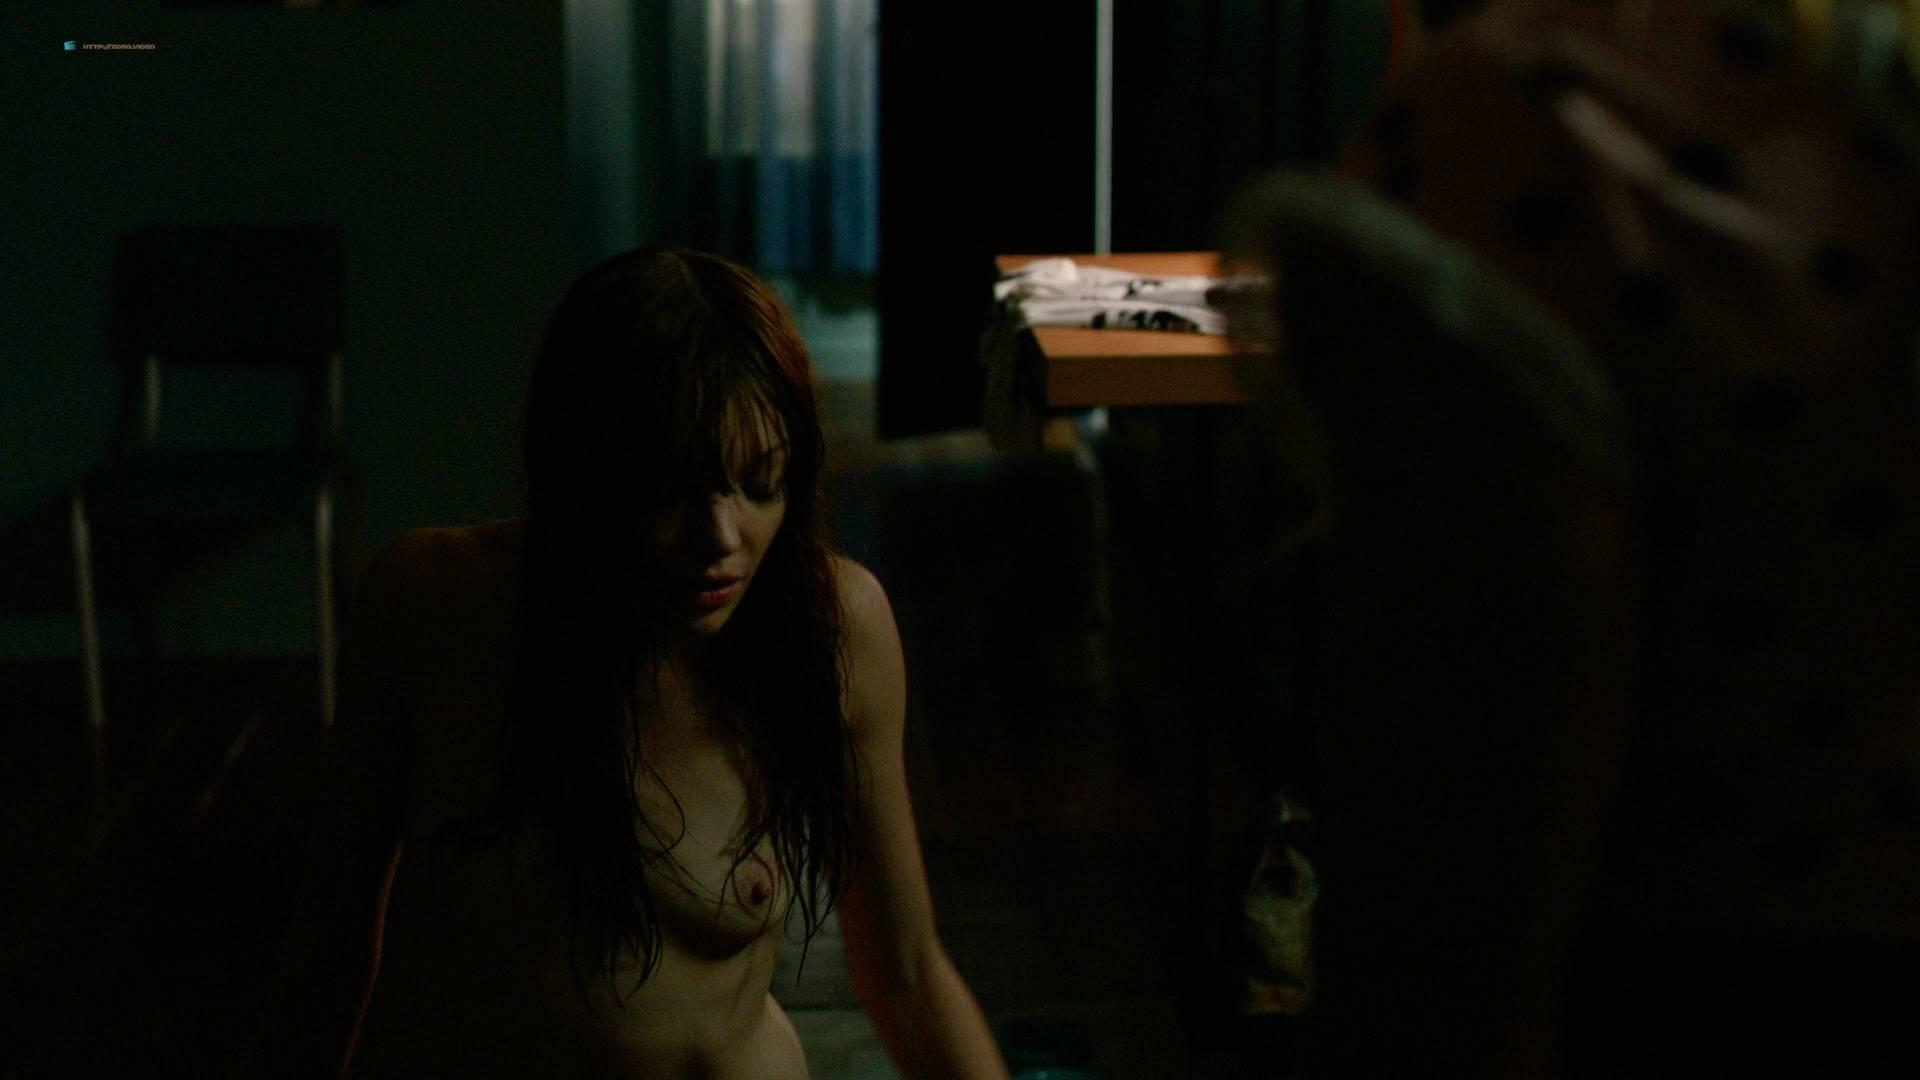 Nicole LaLiberte nude full frontal - Girls Against Boys (2013) HD 1080p BluRay (3)